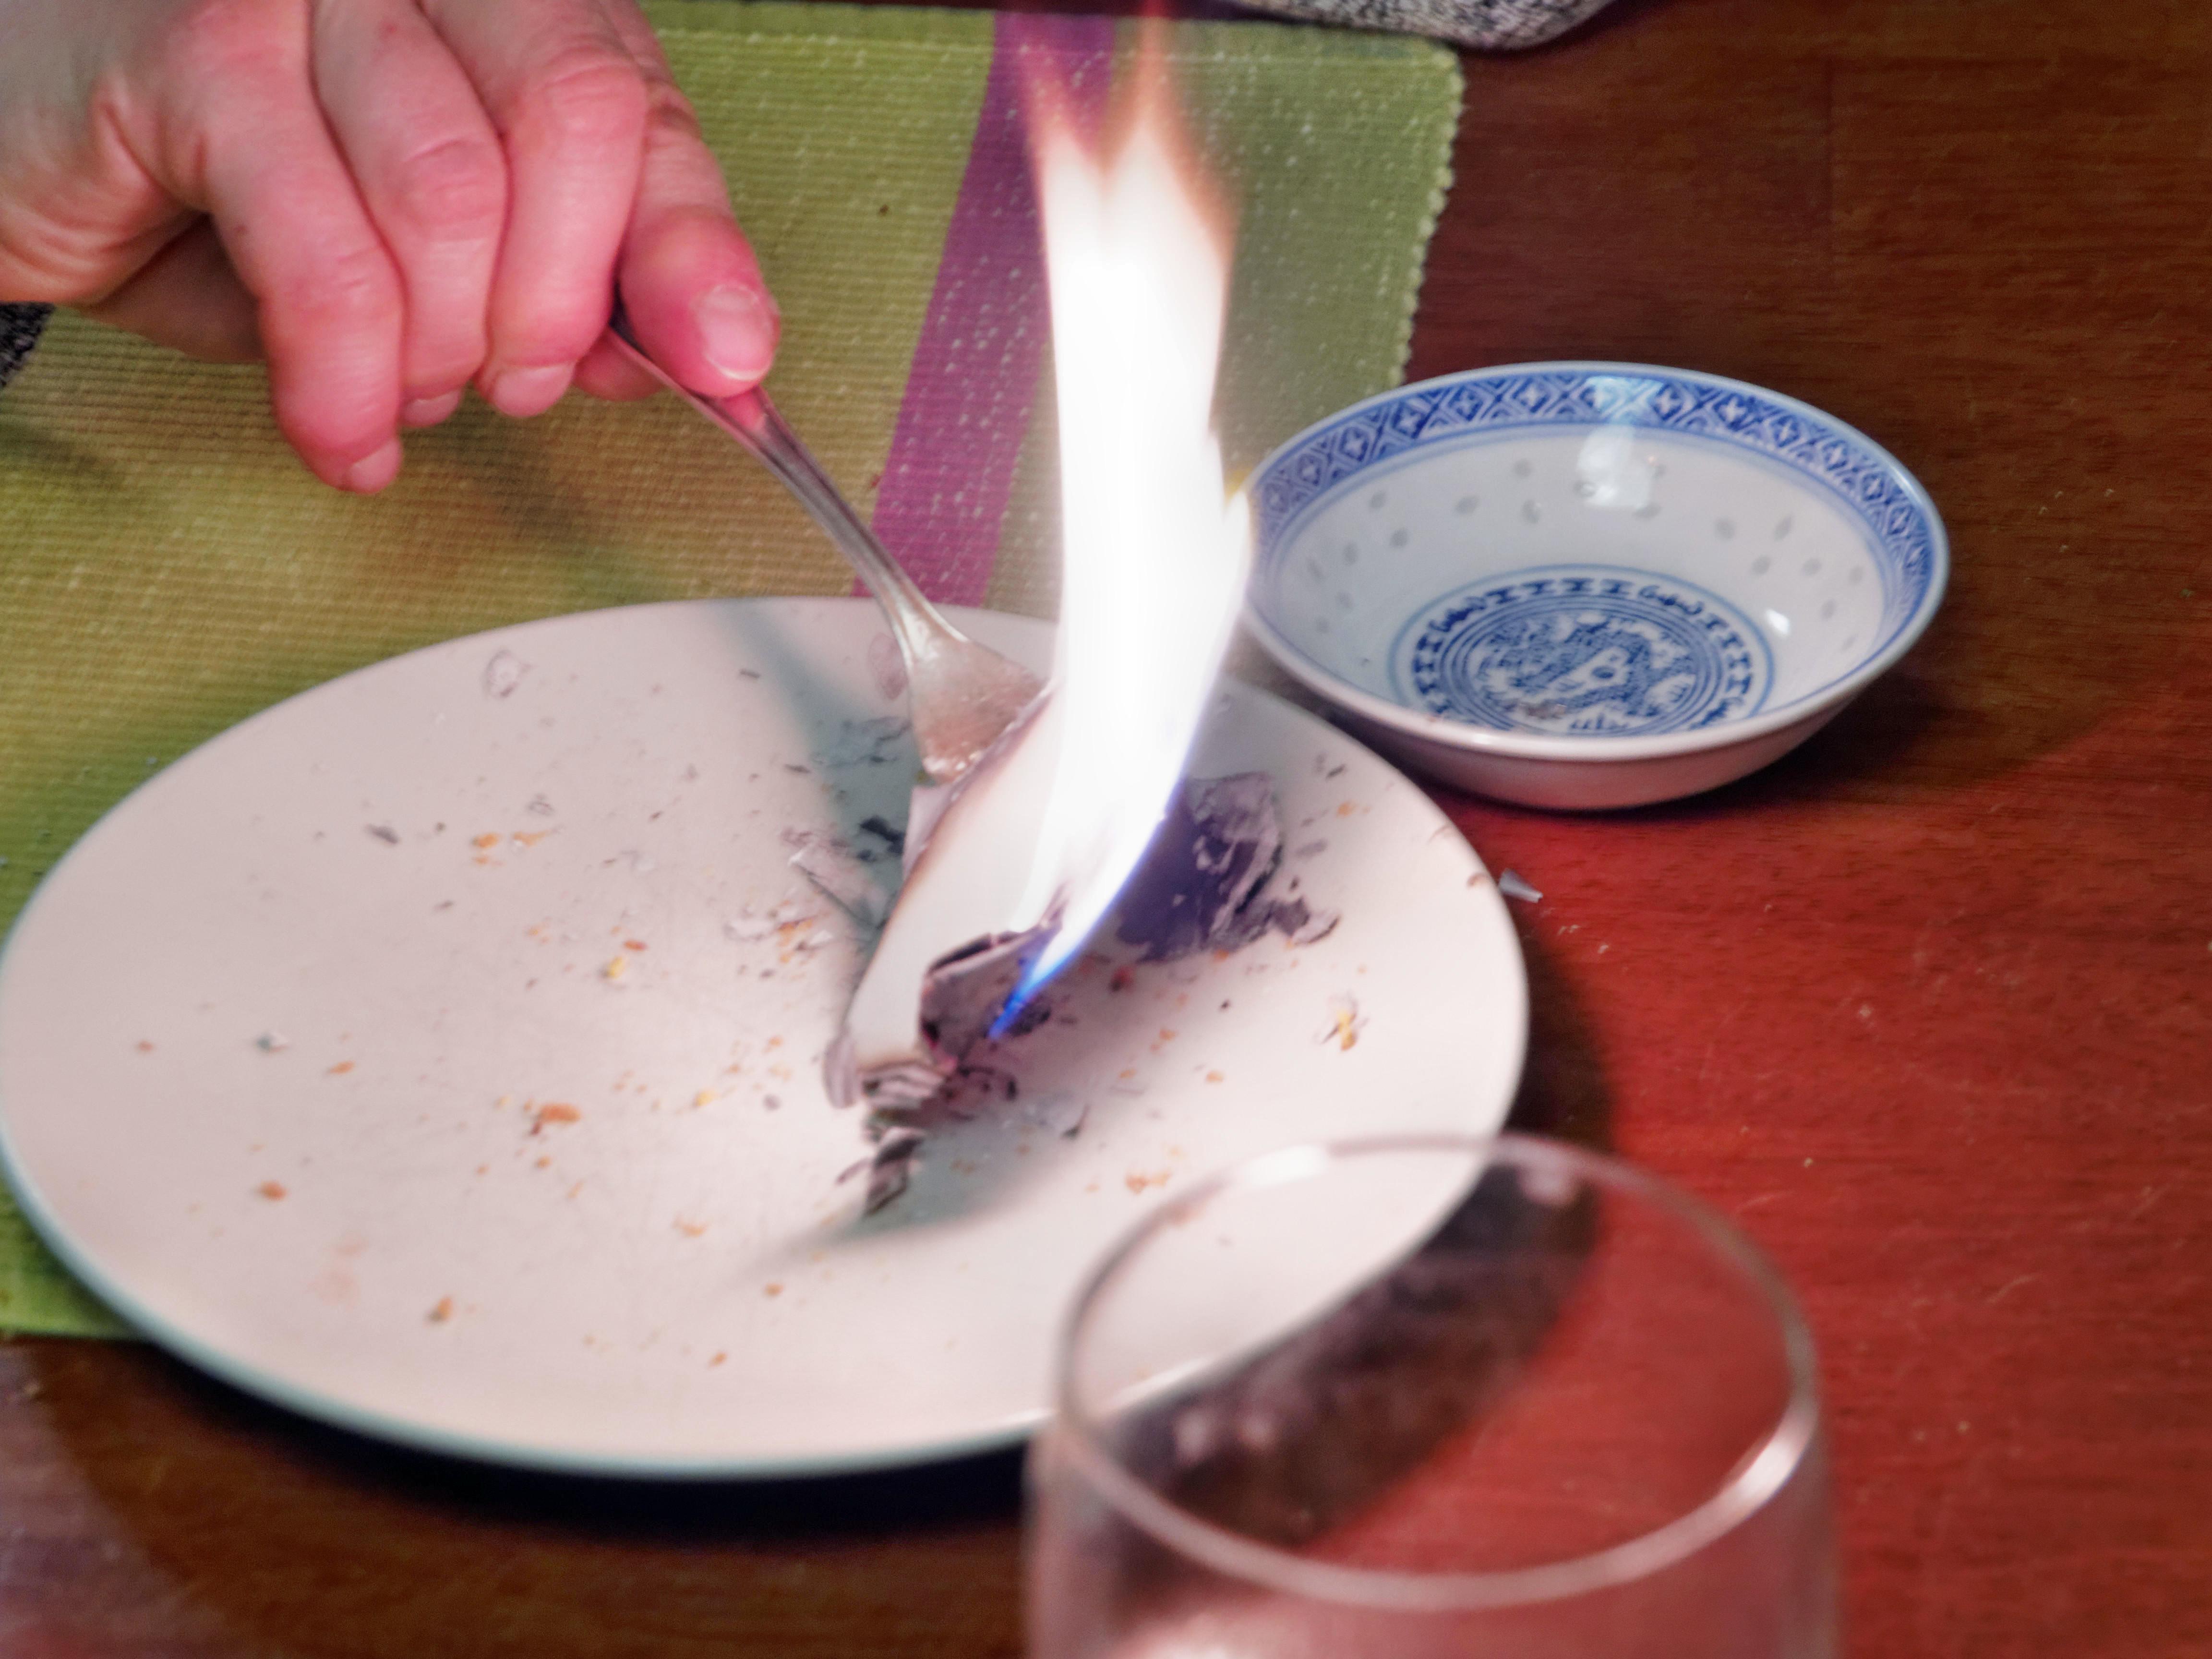 Burning-card-10.jpeg